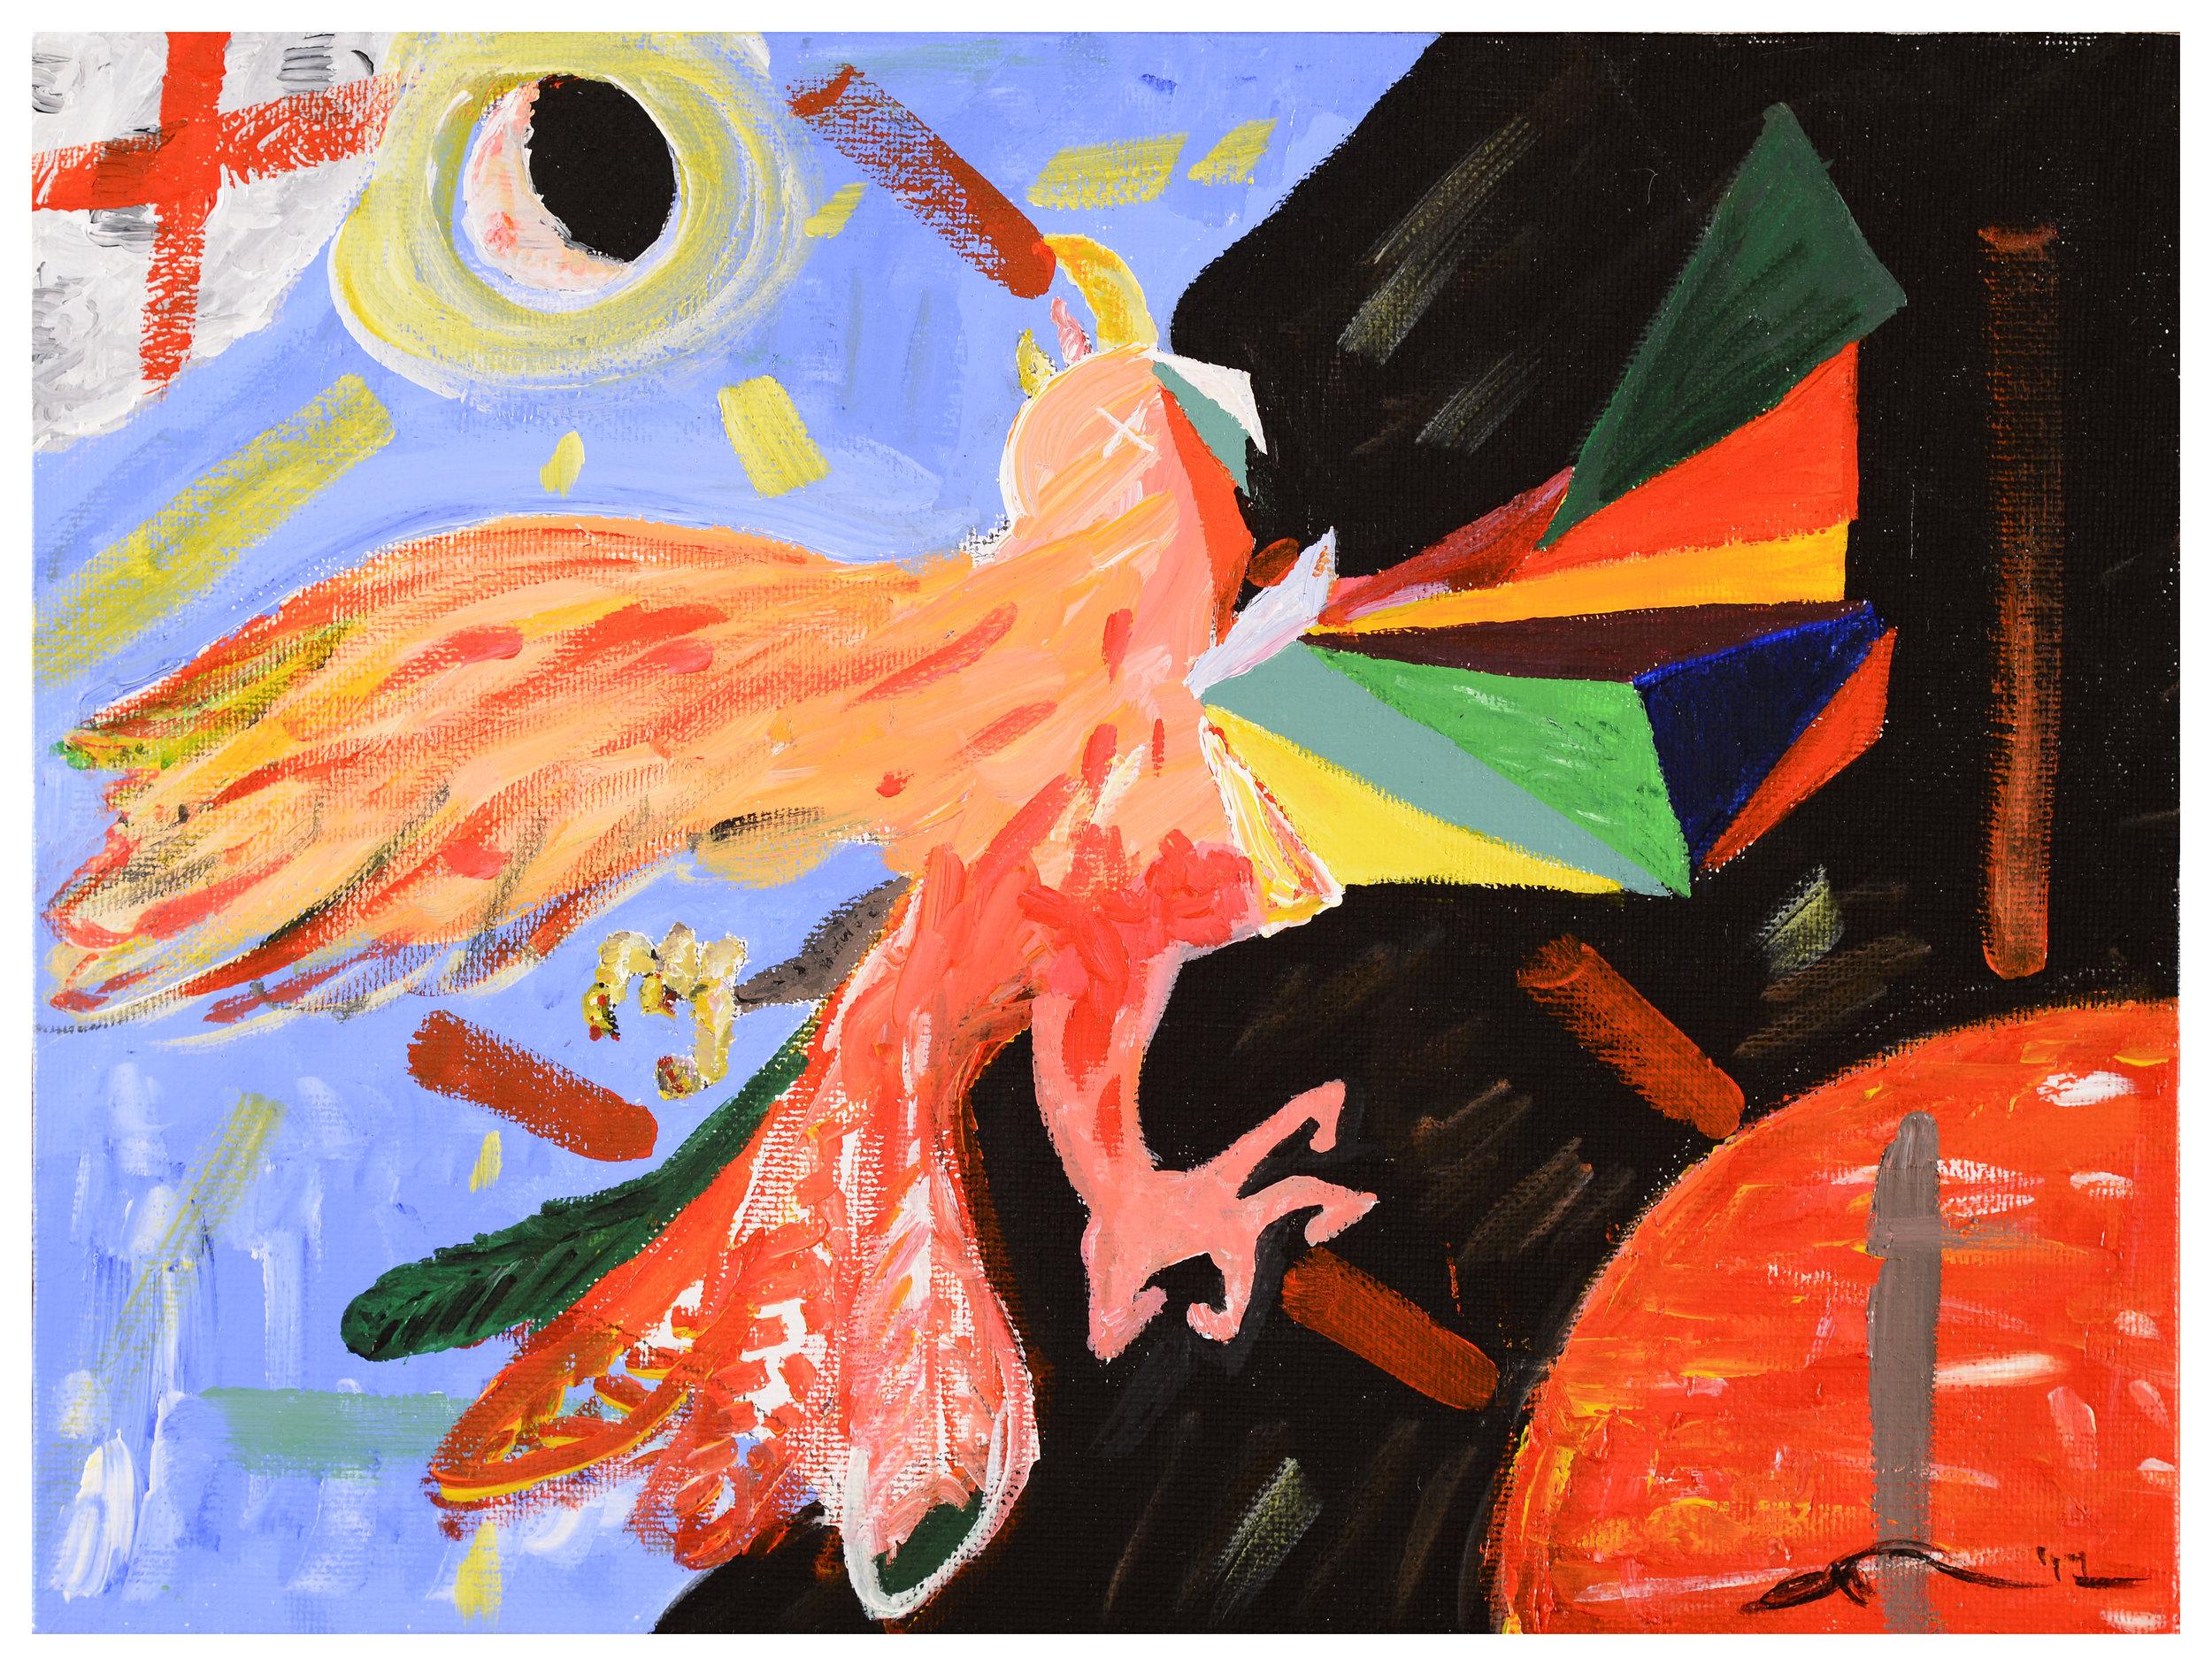 Conversation with Jean-Michel Basquiat I - Phoenix I